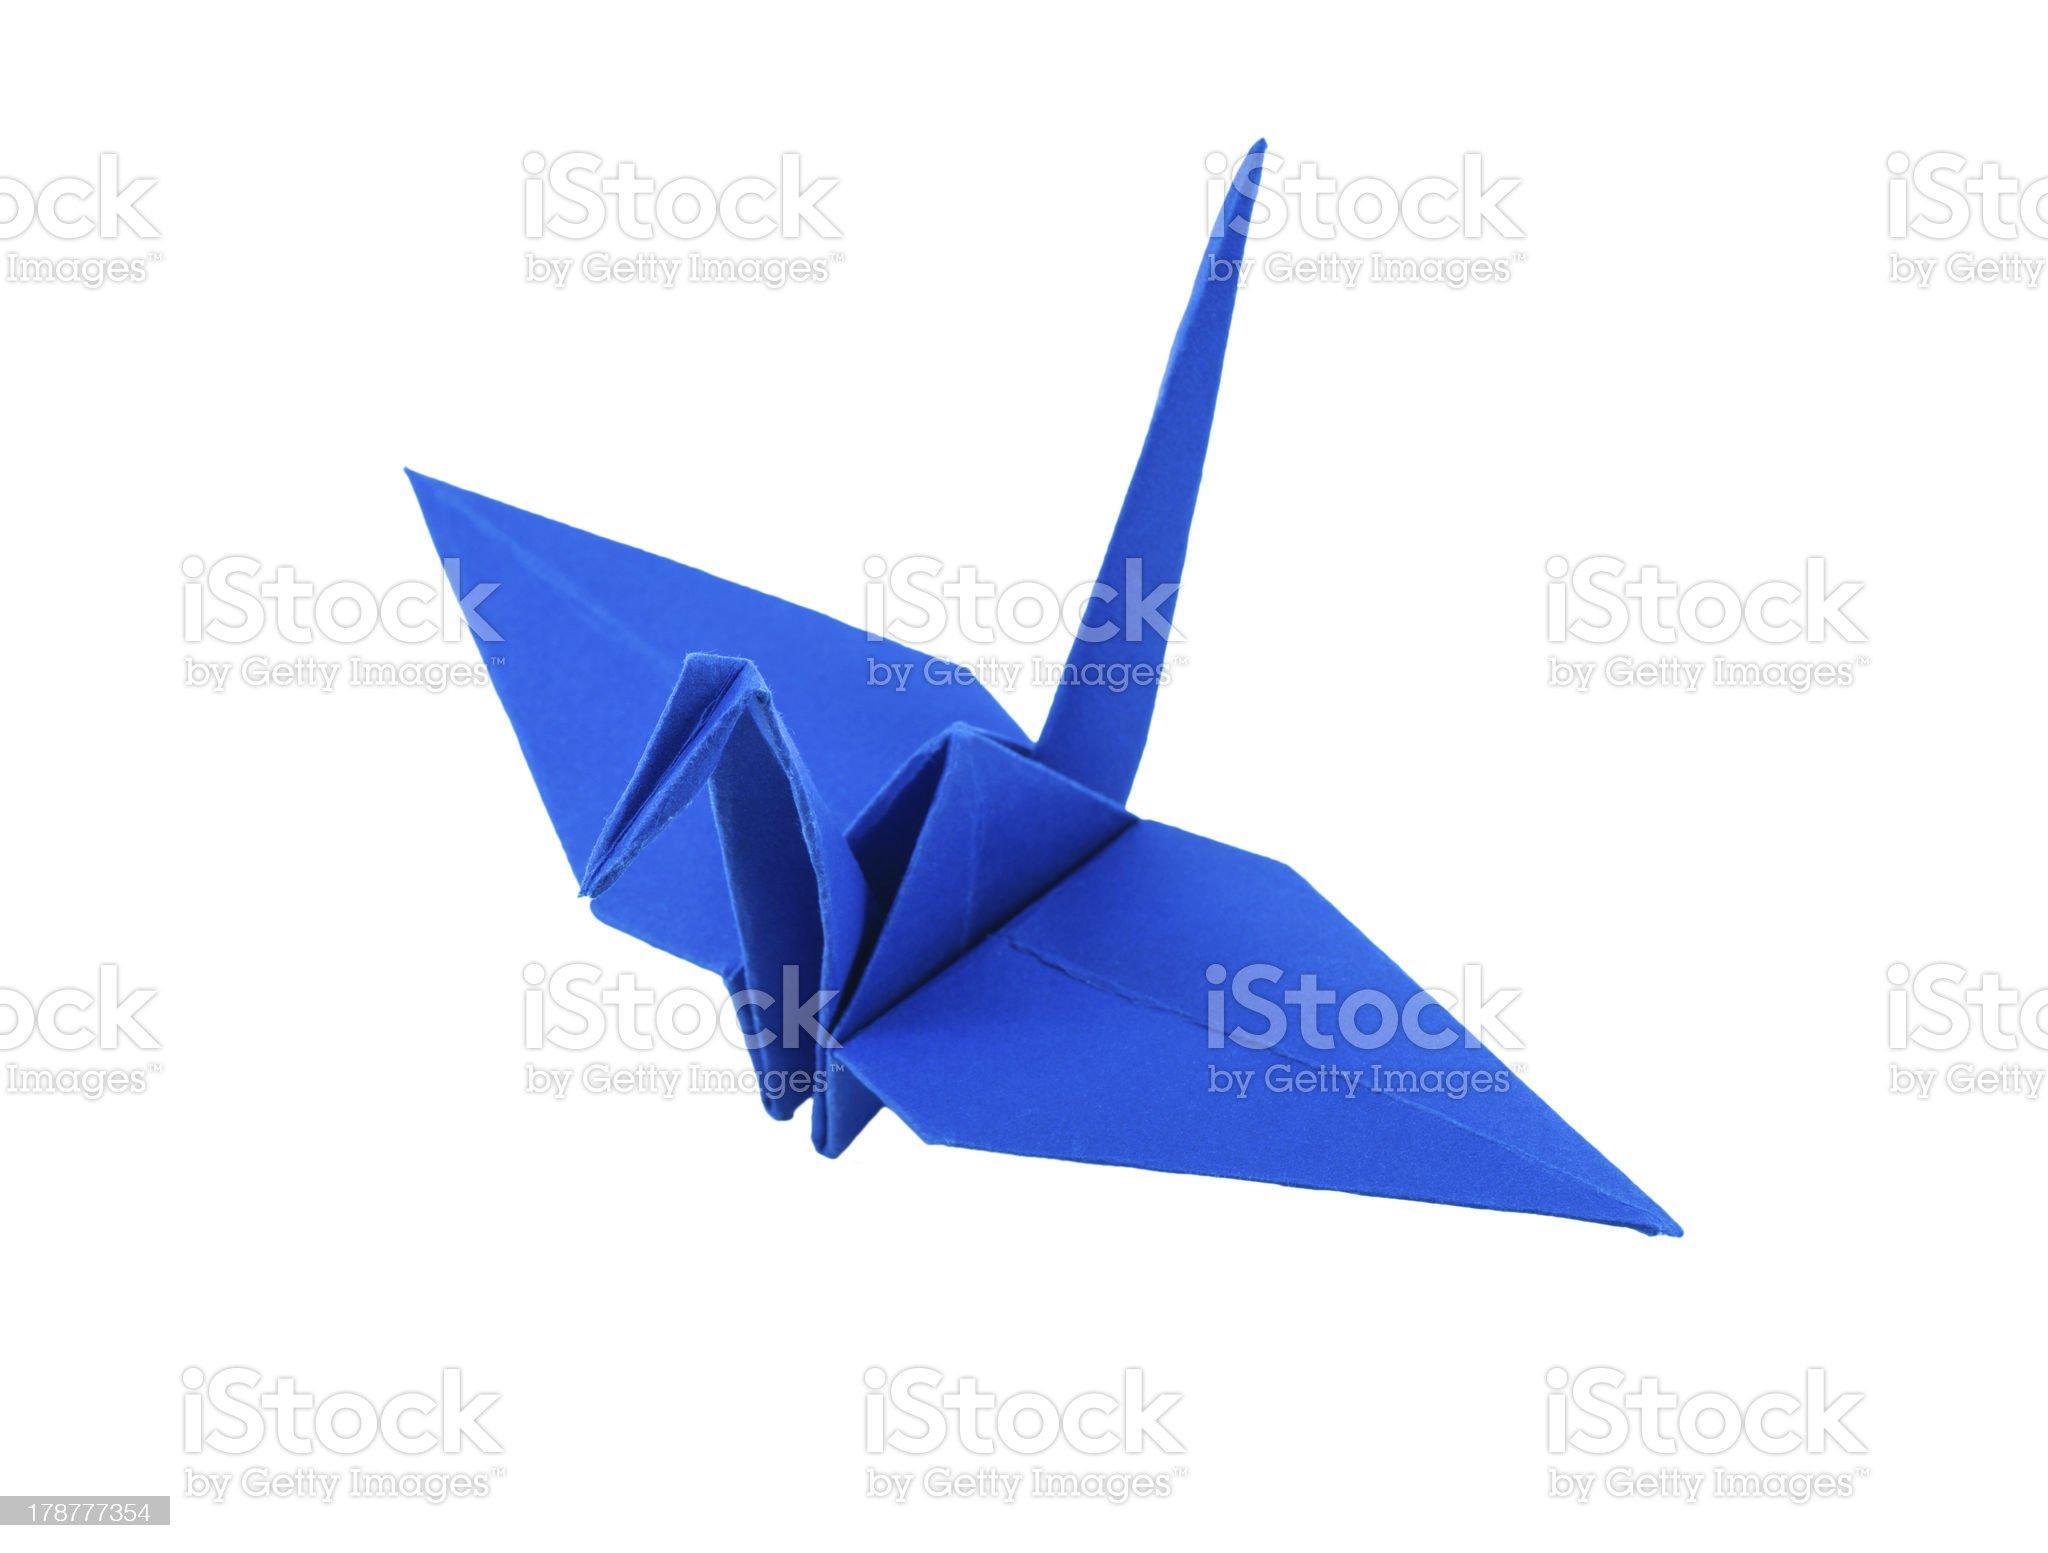 origami blue paper bird on white background royalty-free stock photo